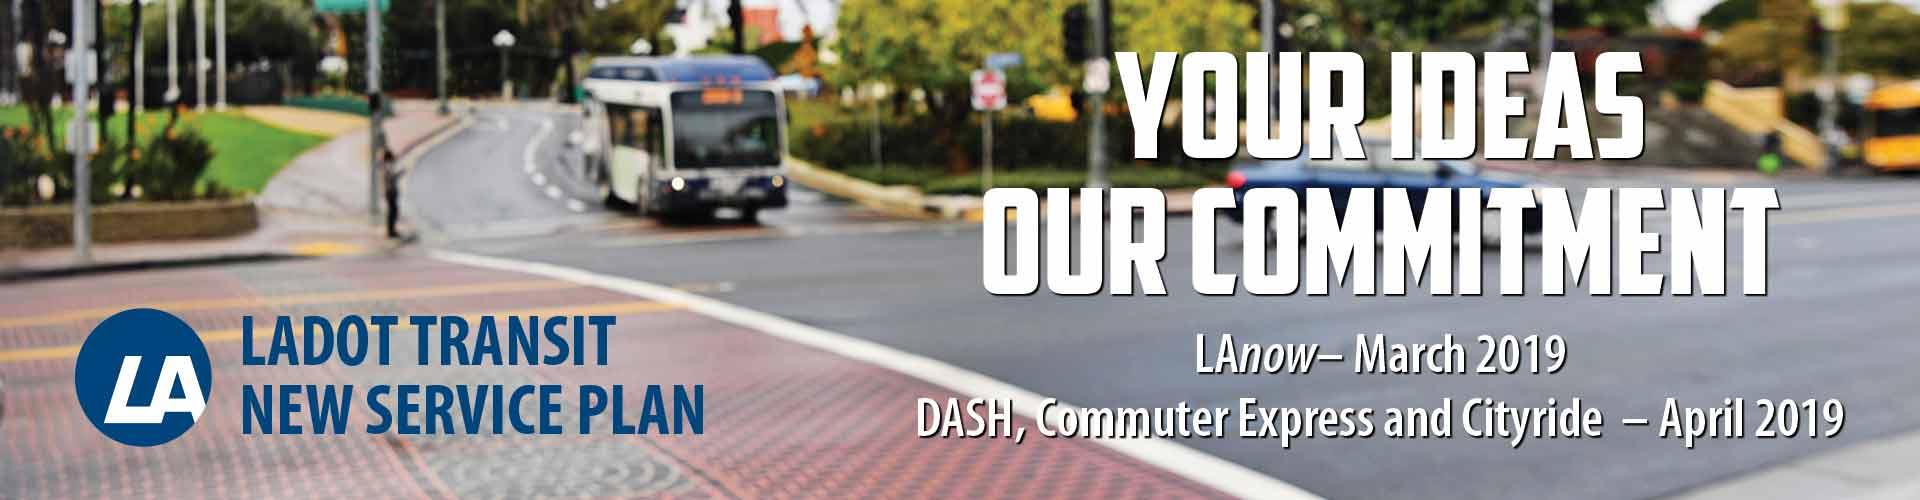 LADOT Transit - DASH, Commuter Express, Cityride